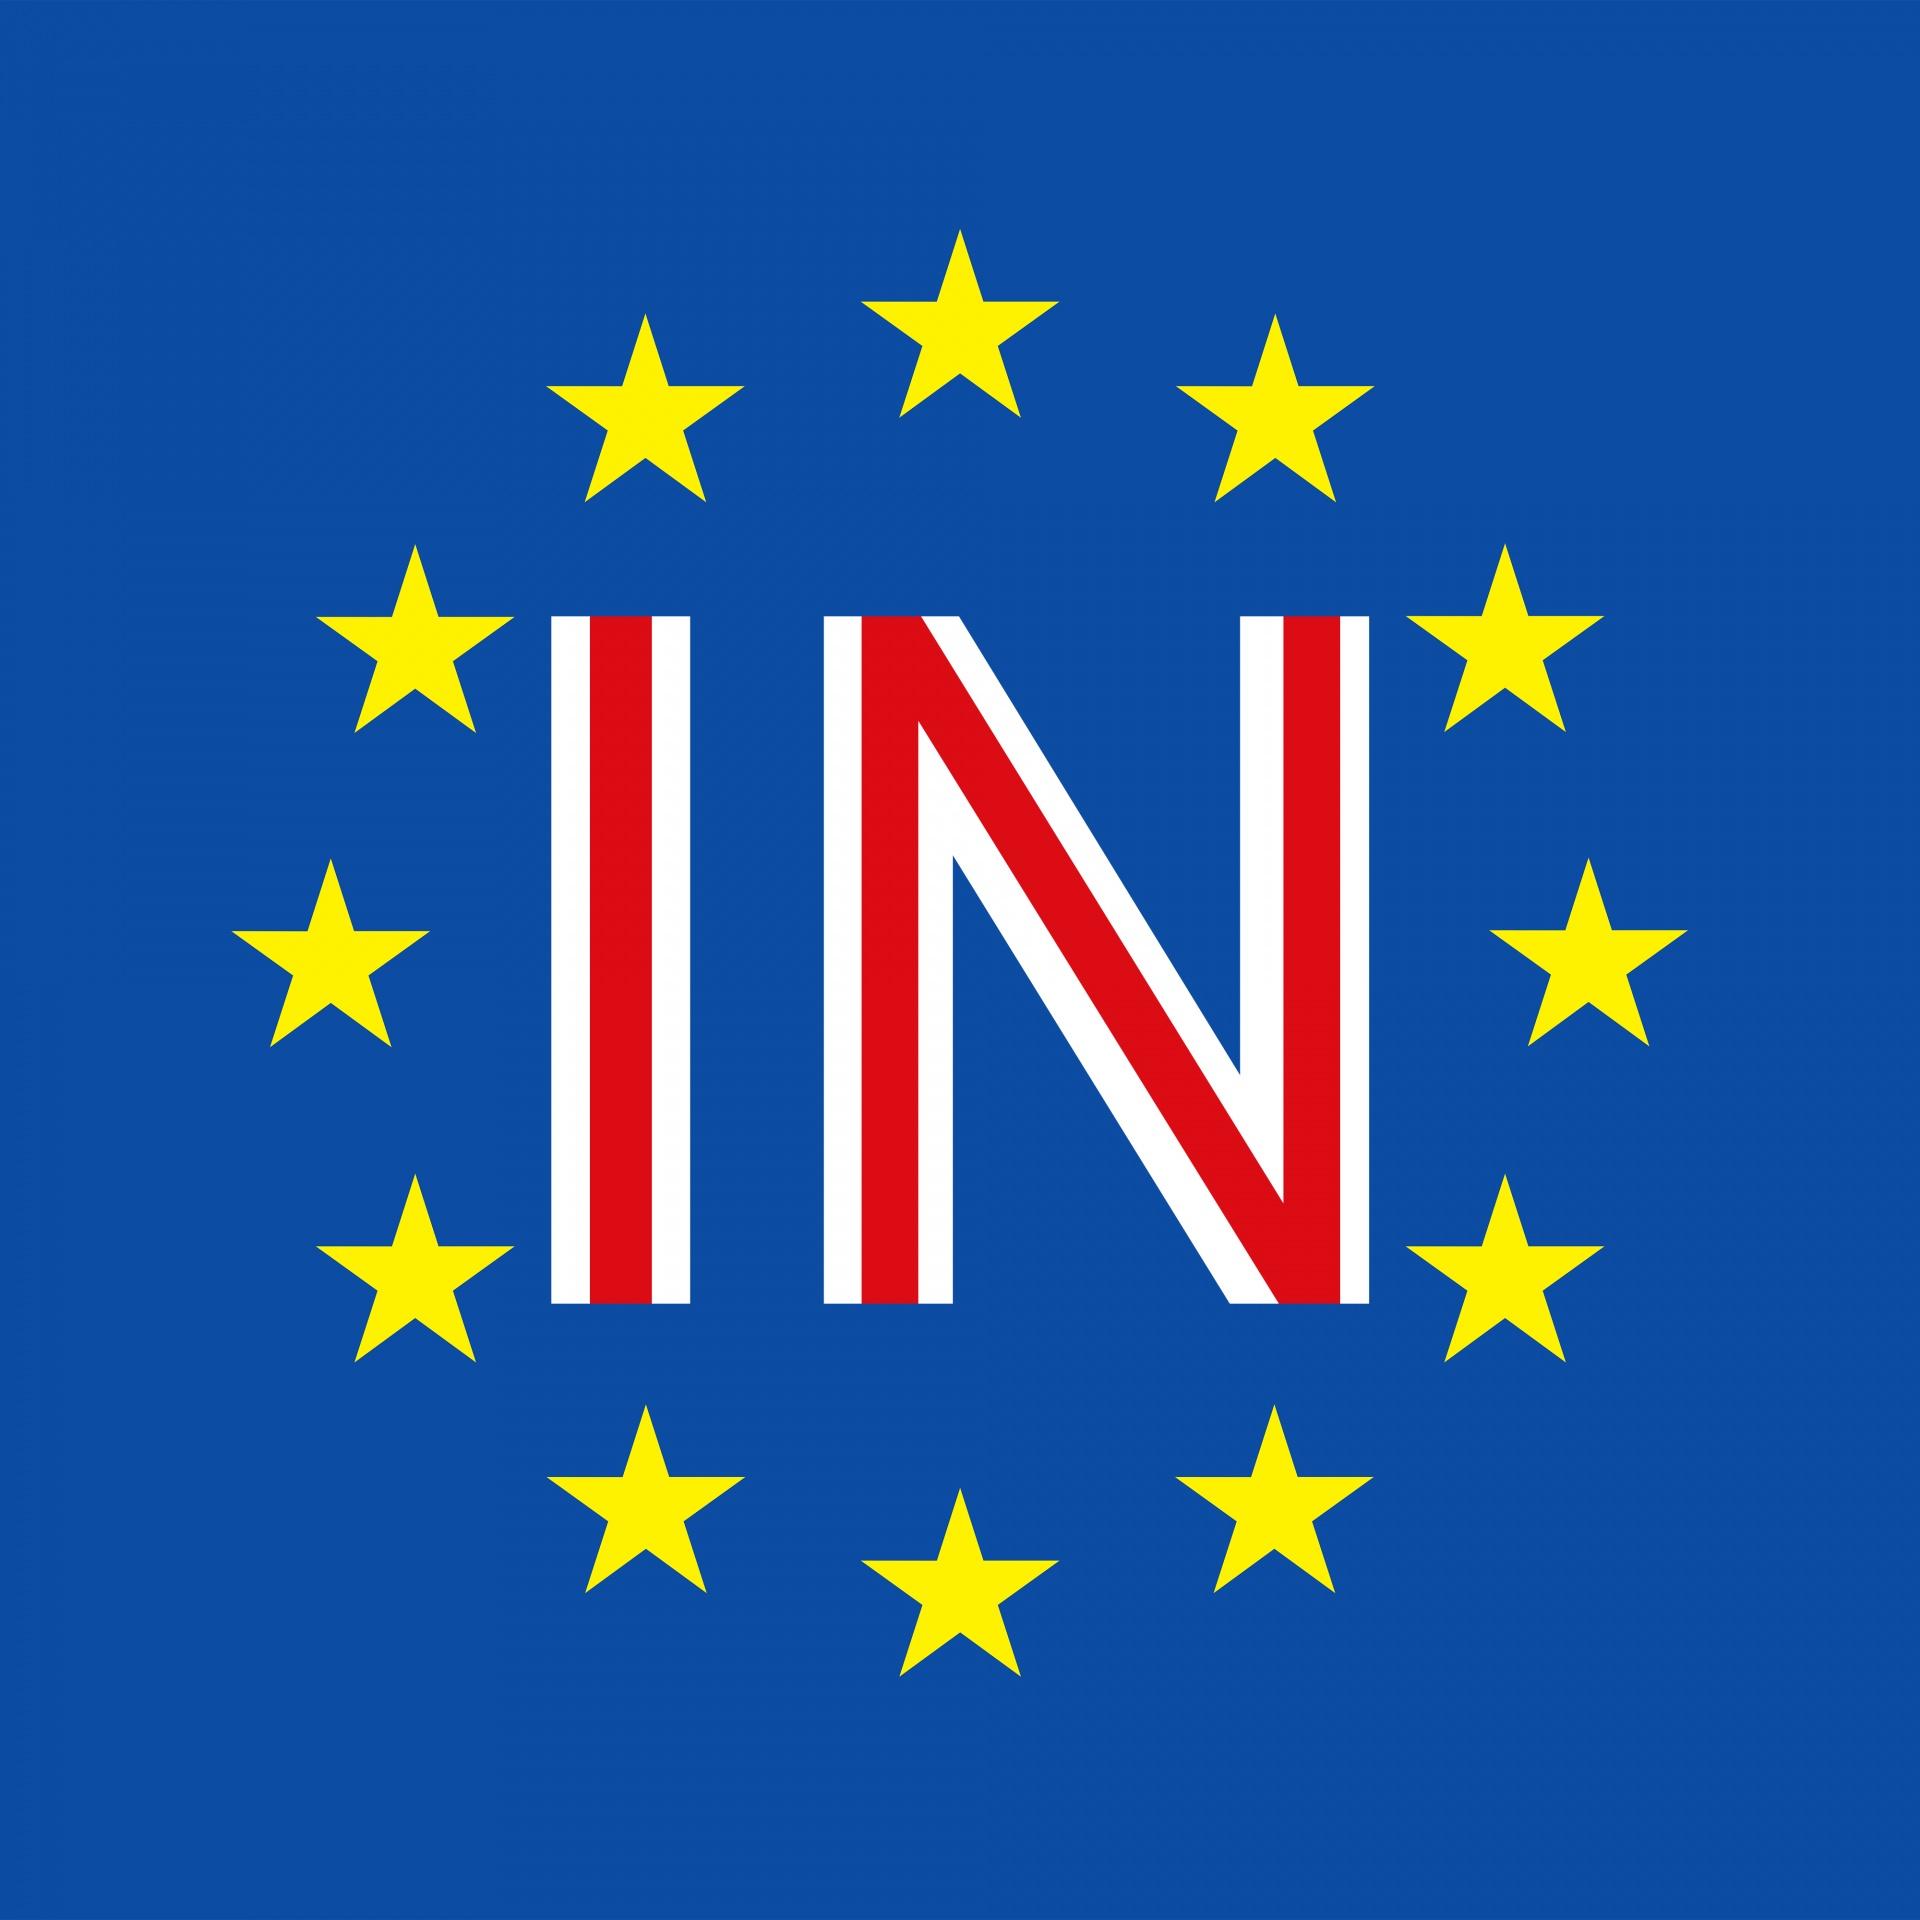 referendum en el reino unido incertidumbres del brexit